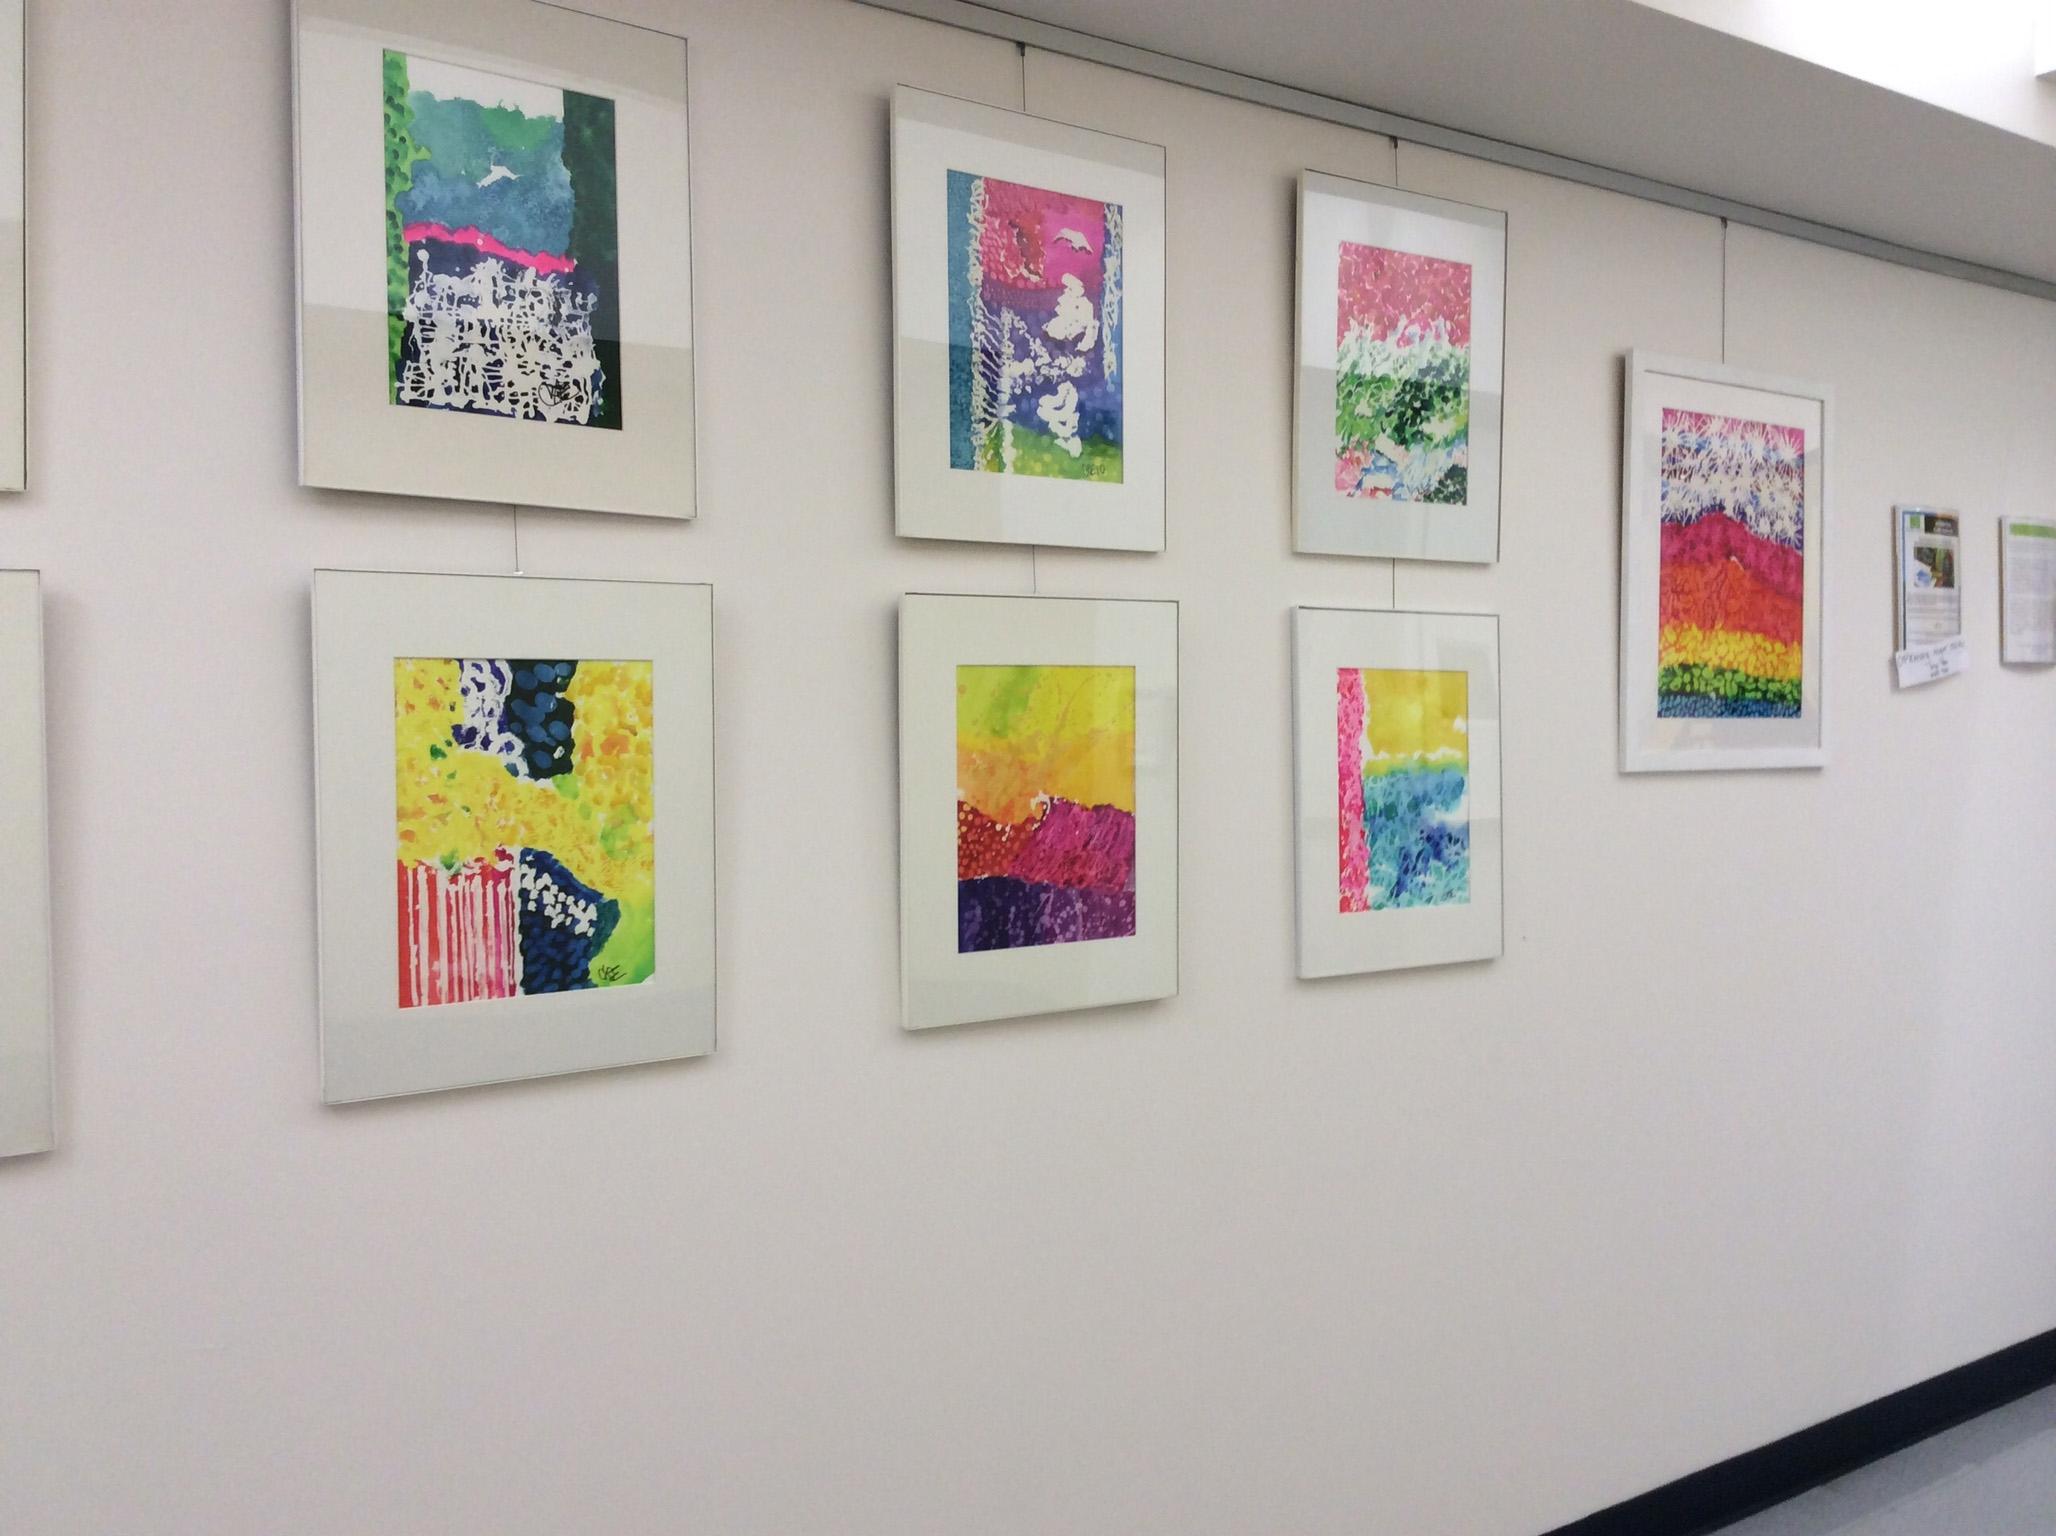 Art display at The Creative Center.  ©New York's Creative Center at University Settlement